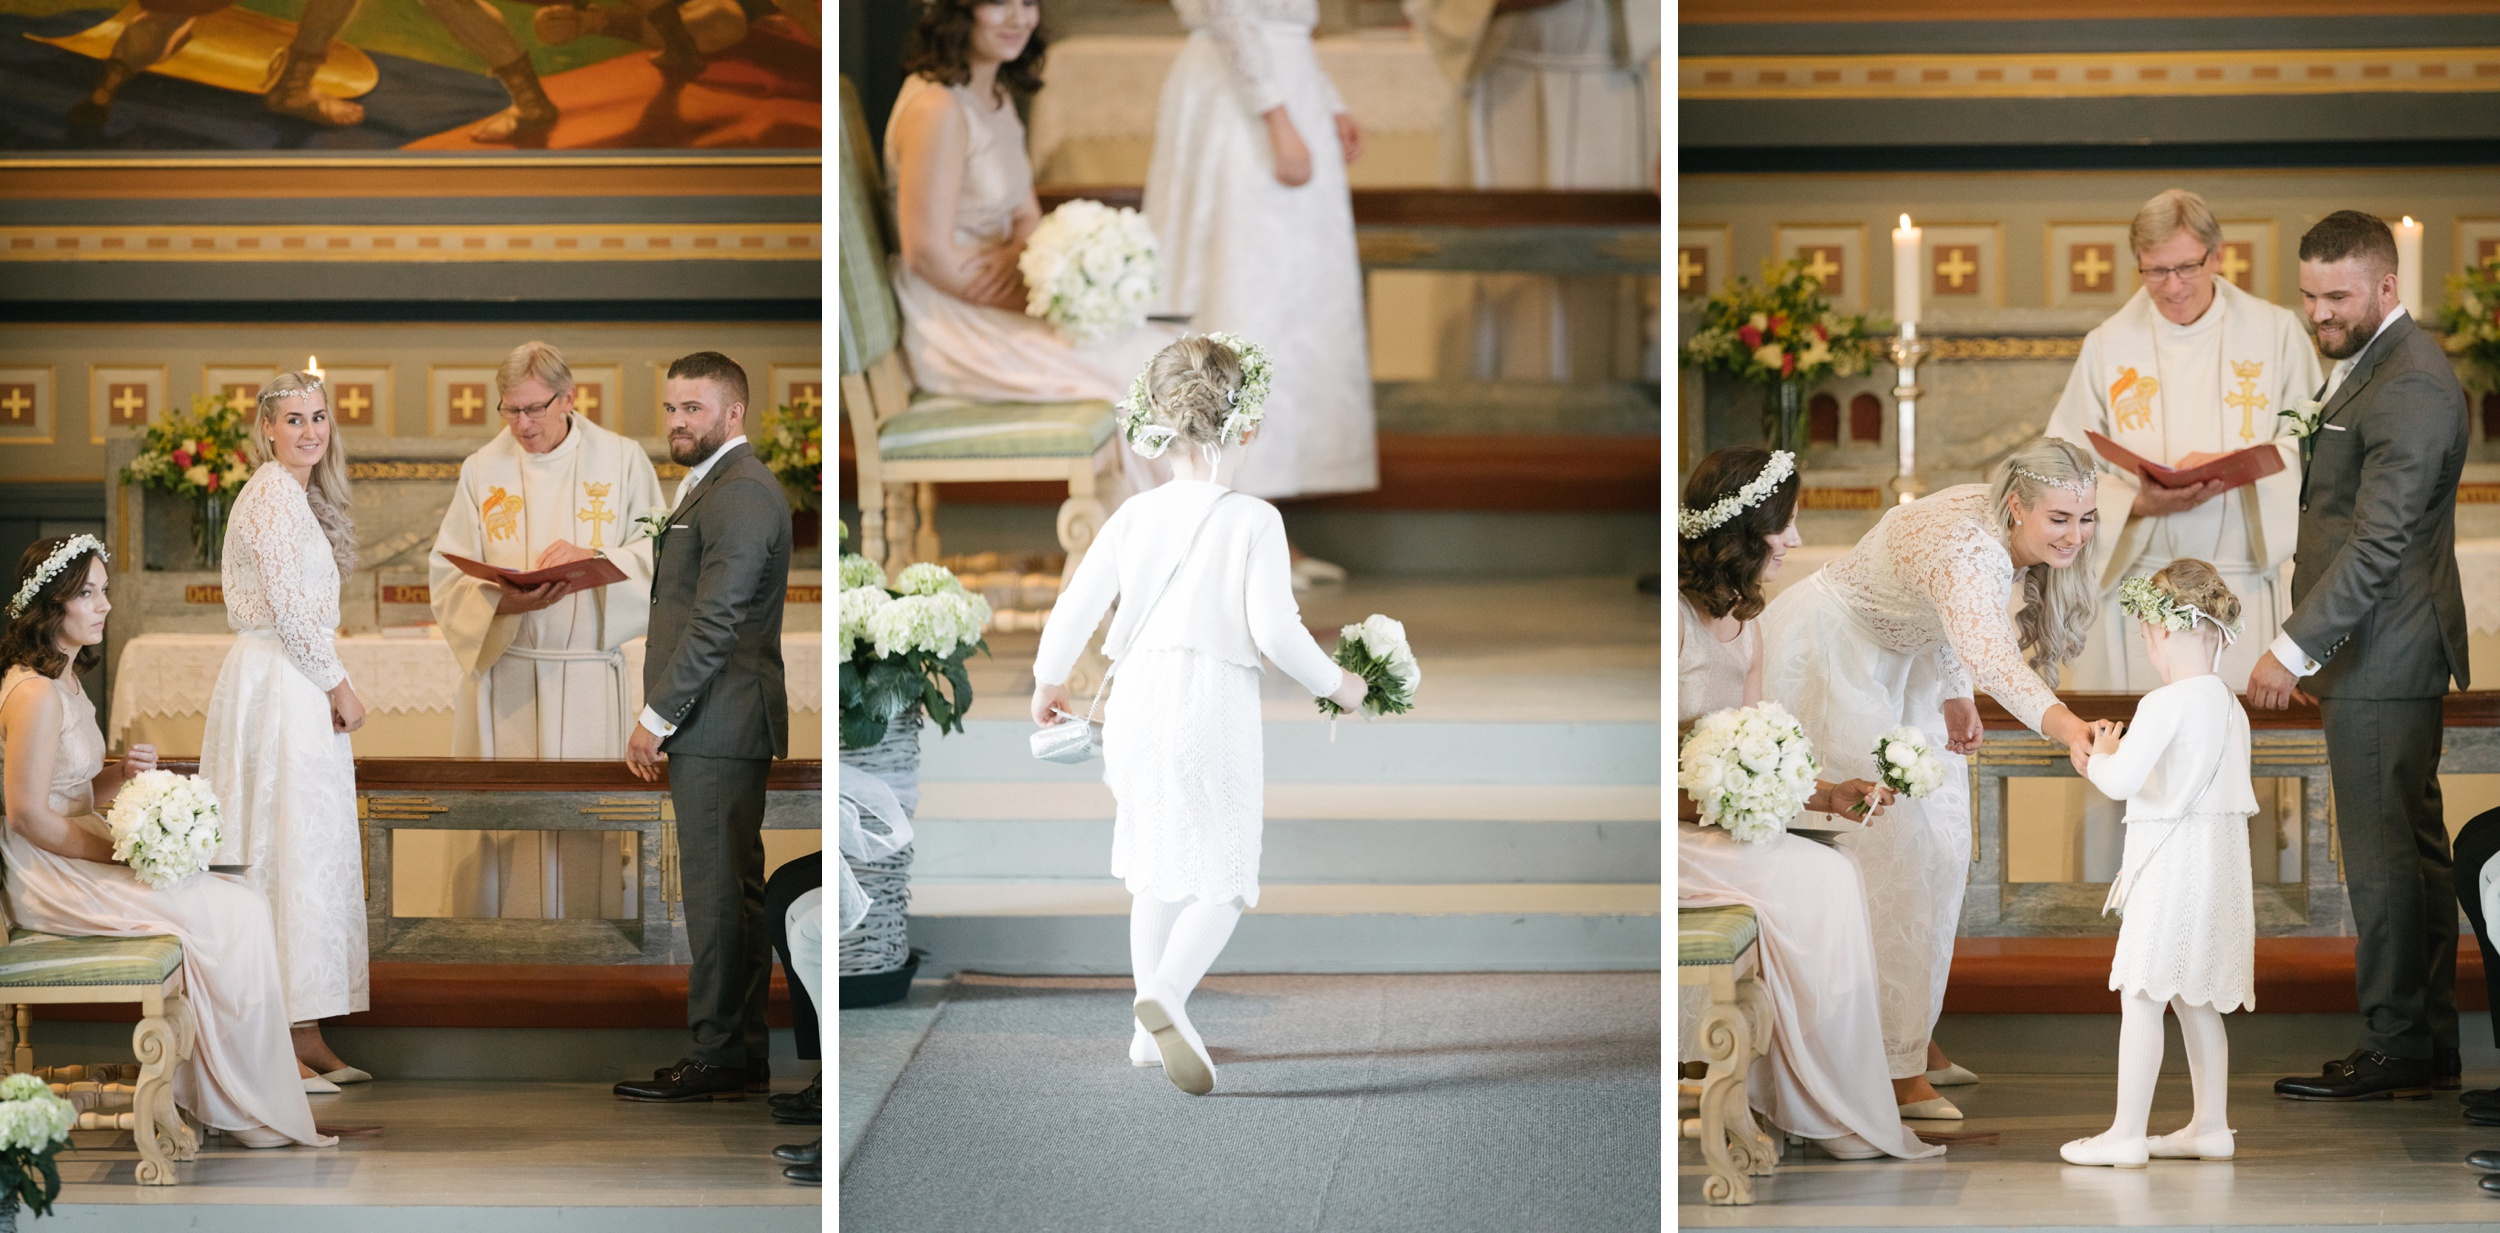 bryllup-bryllupsfotografering-bryllupsfotograf-sarpsborg-20170520-_H2A0445Camilla-og-ruben_WEB.jpg